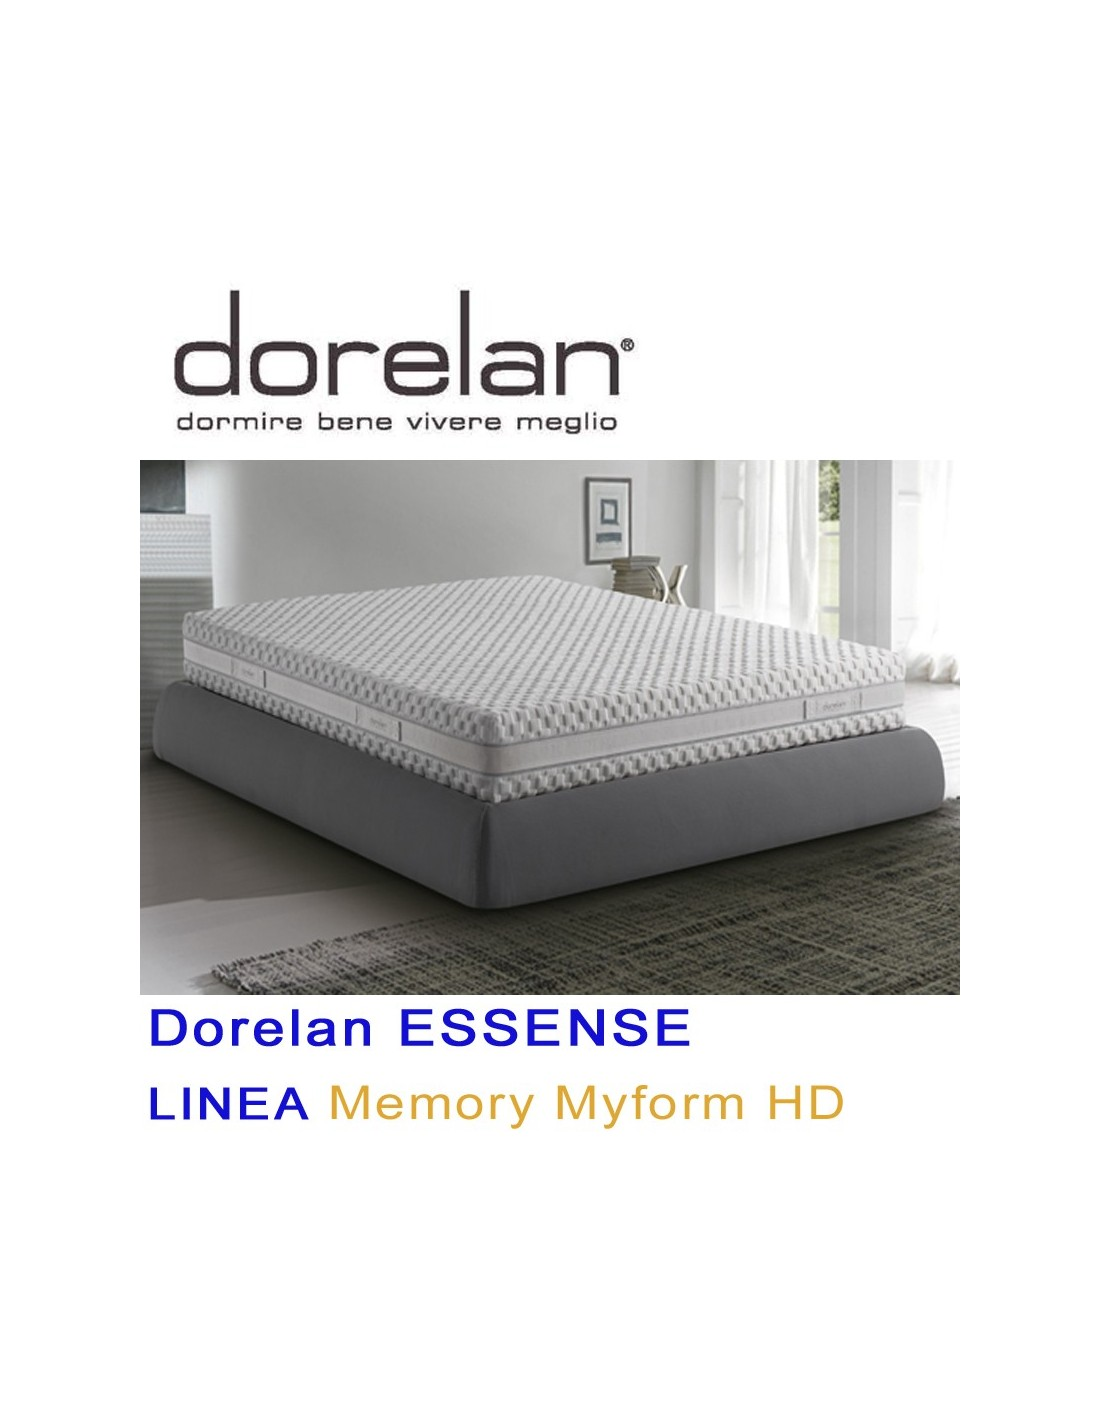 Dorelan Myform Hd Essense Impulse Portanza Media